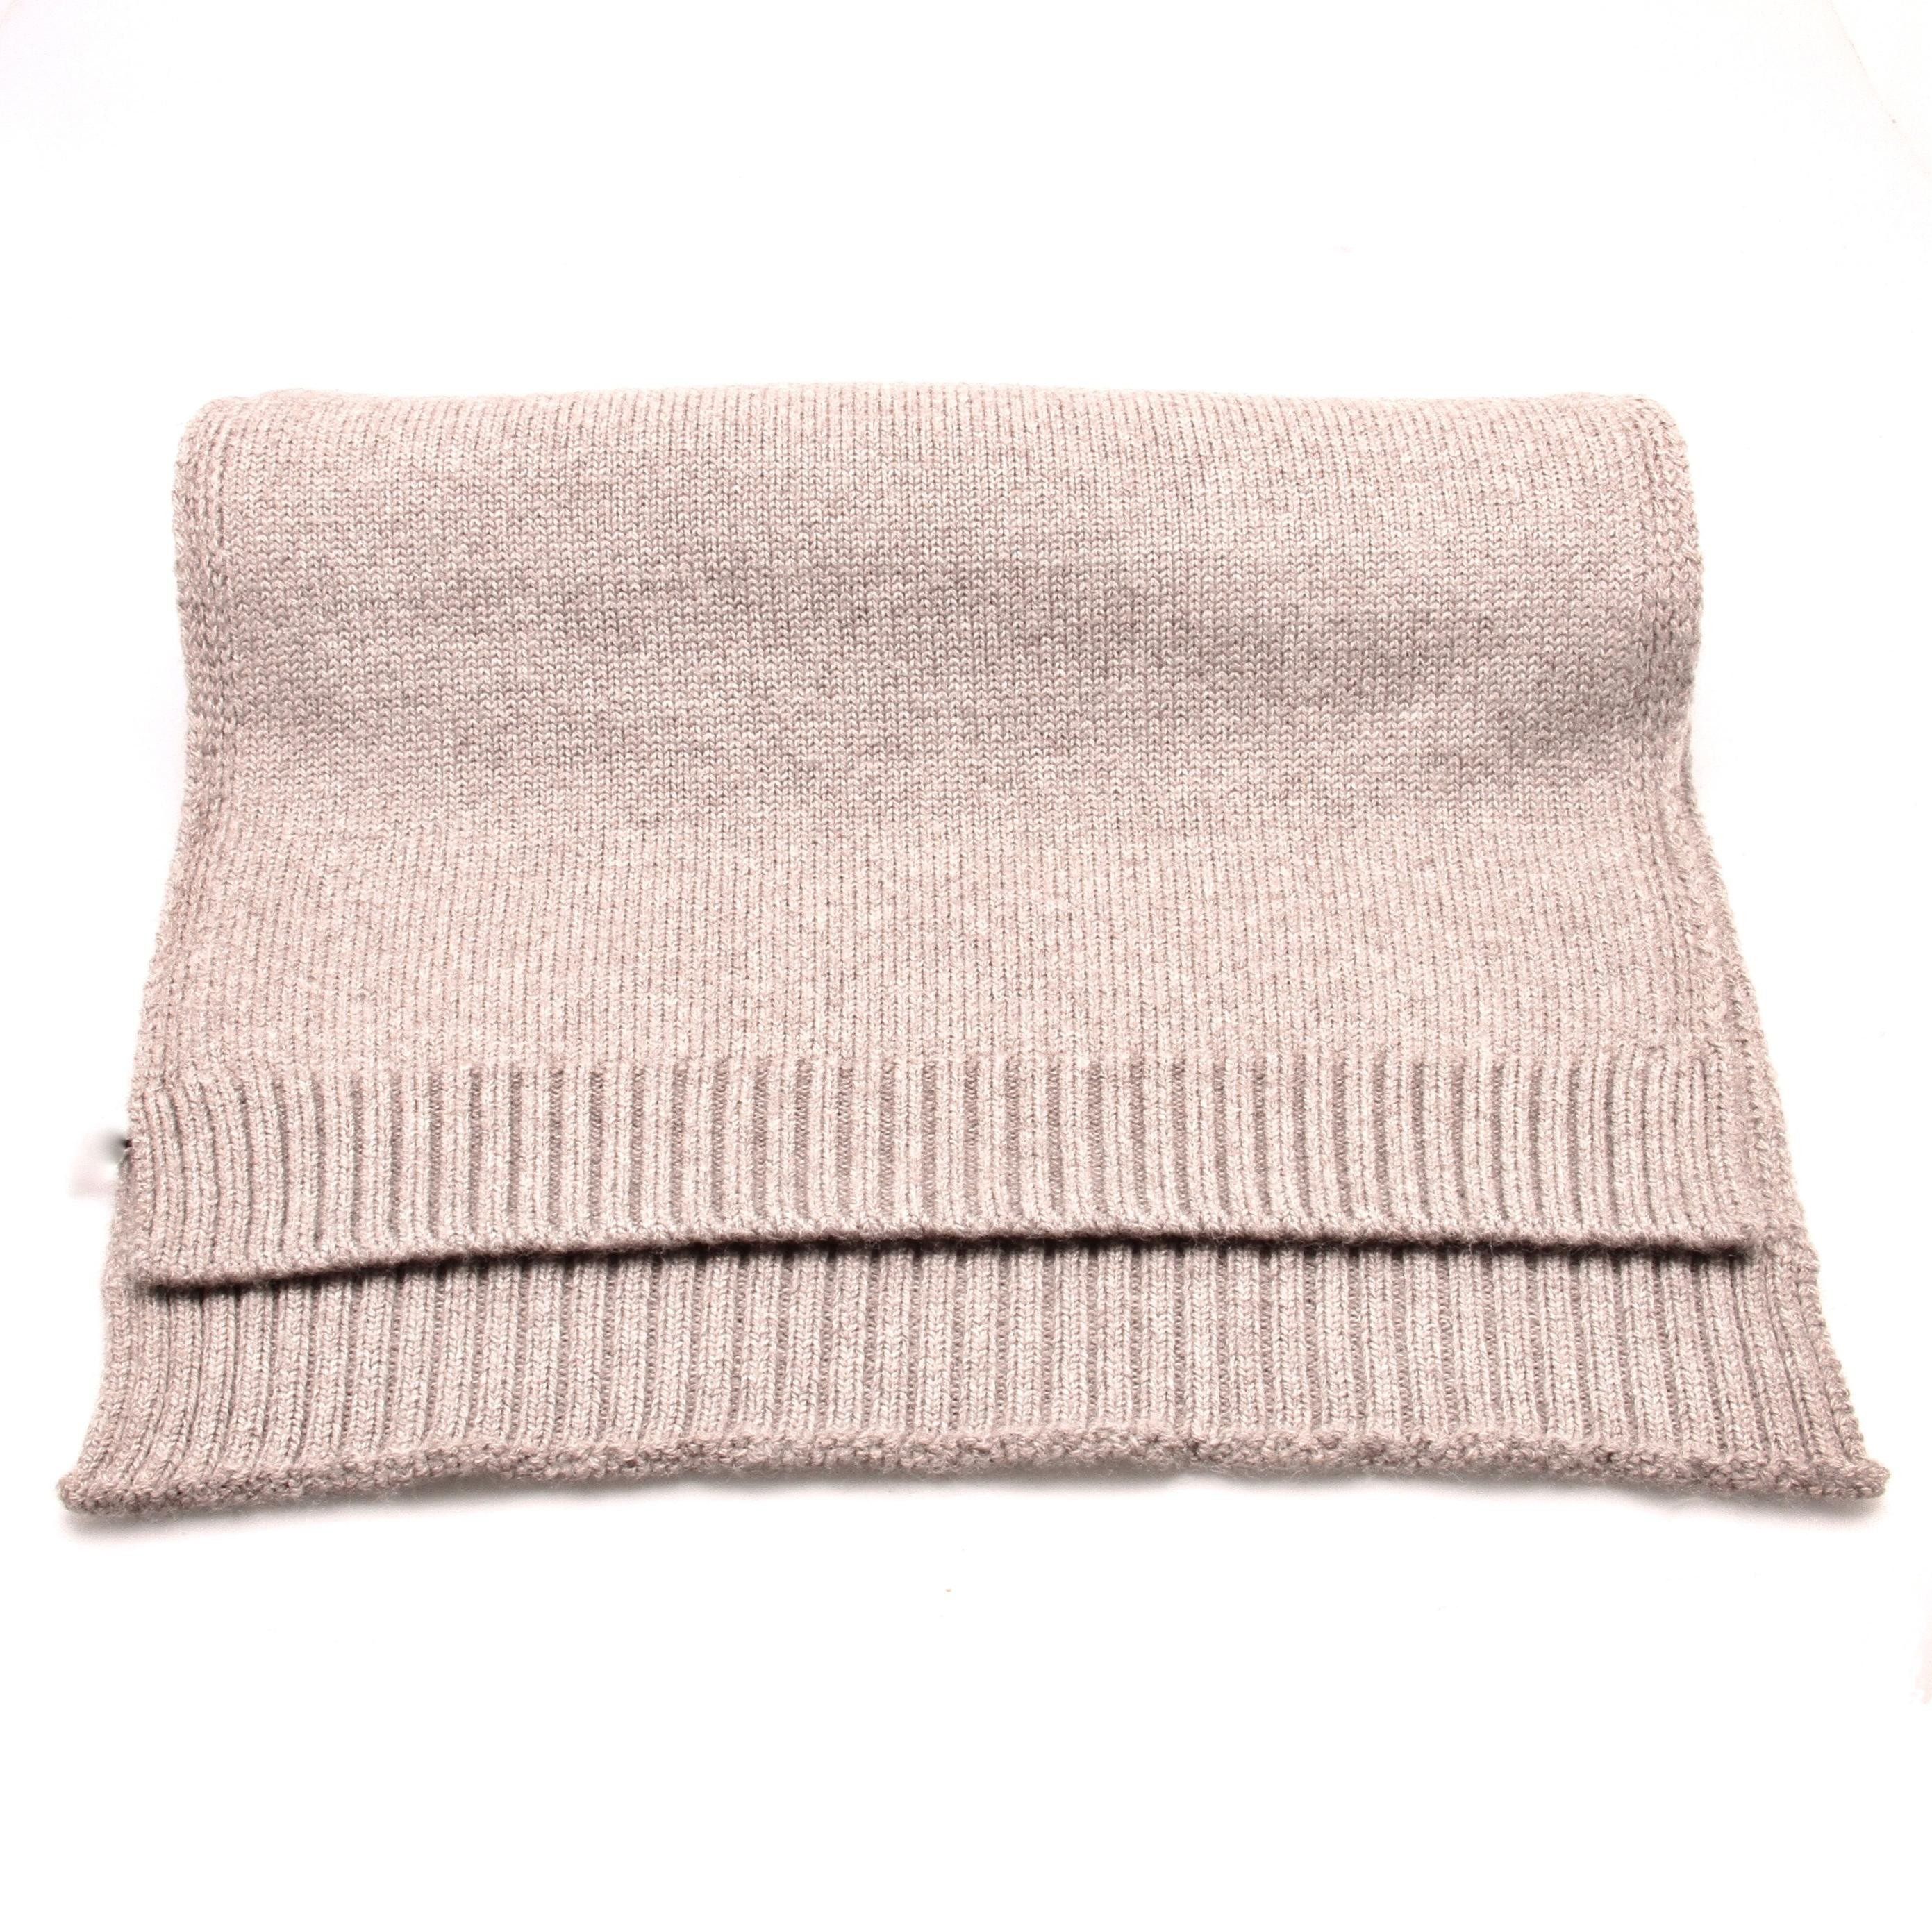 Echarpe Beige - Pure laine Merinos